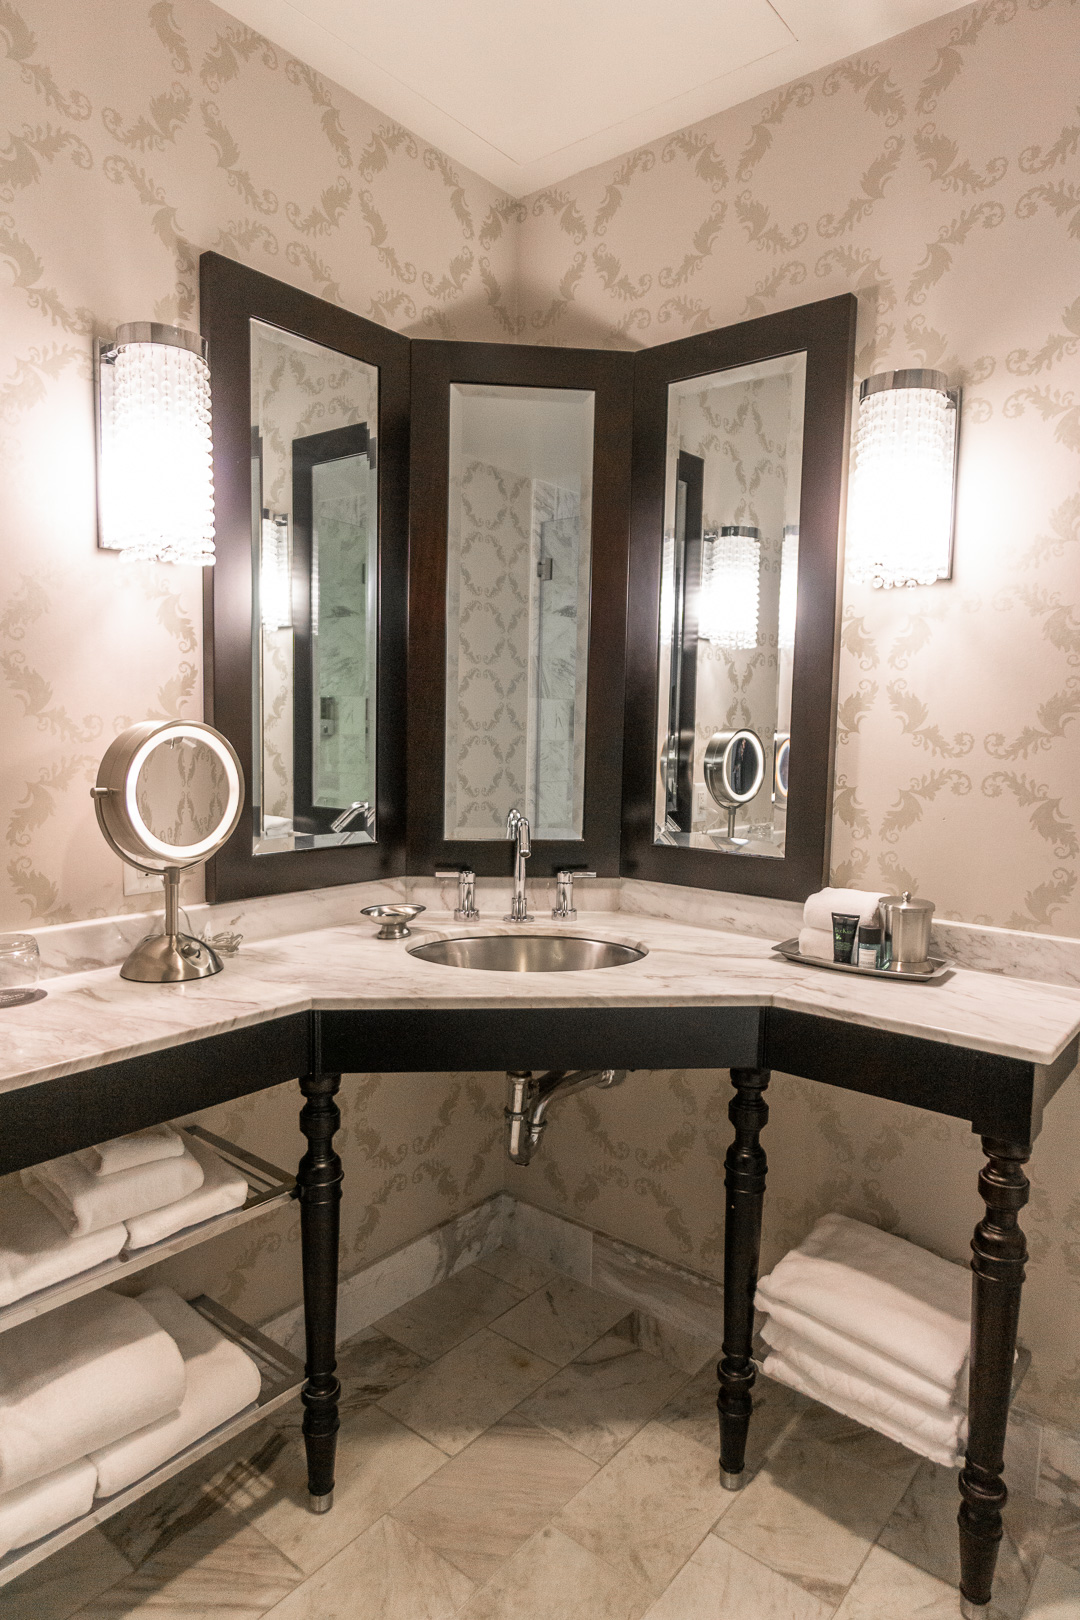 The Nines Hotel Superior Room Bathroom